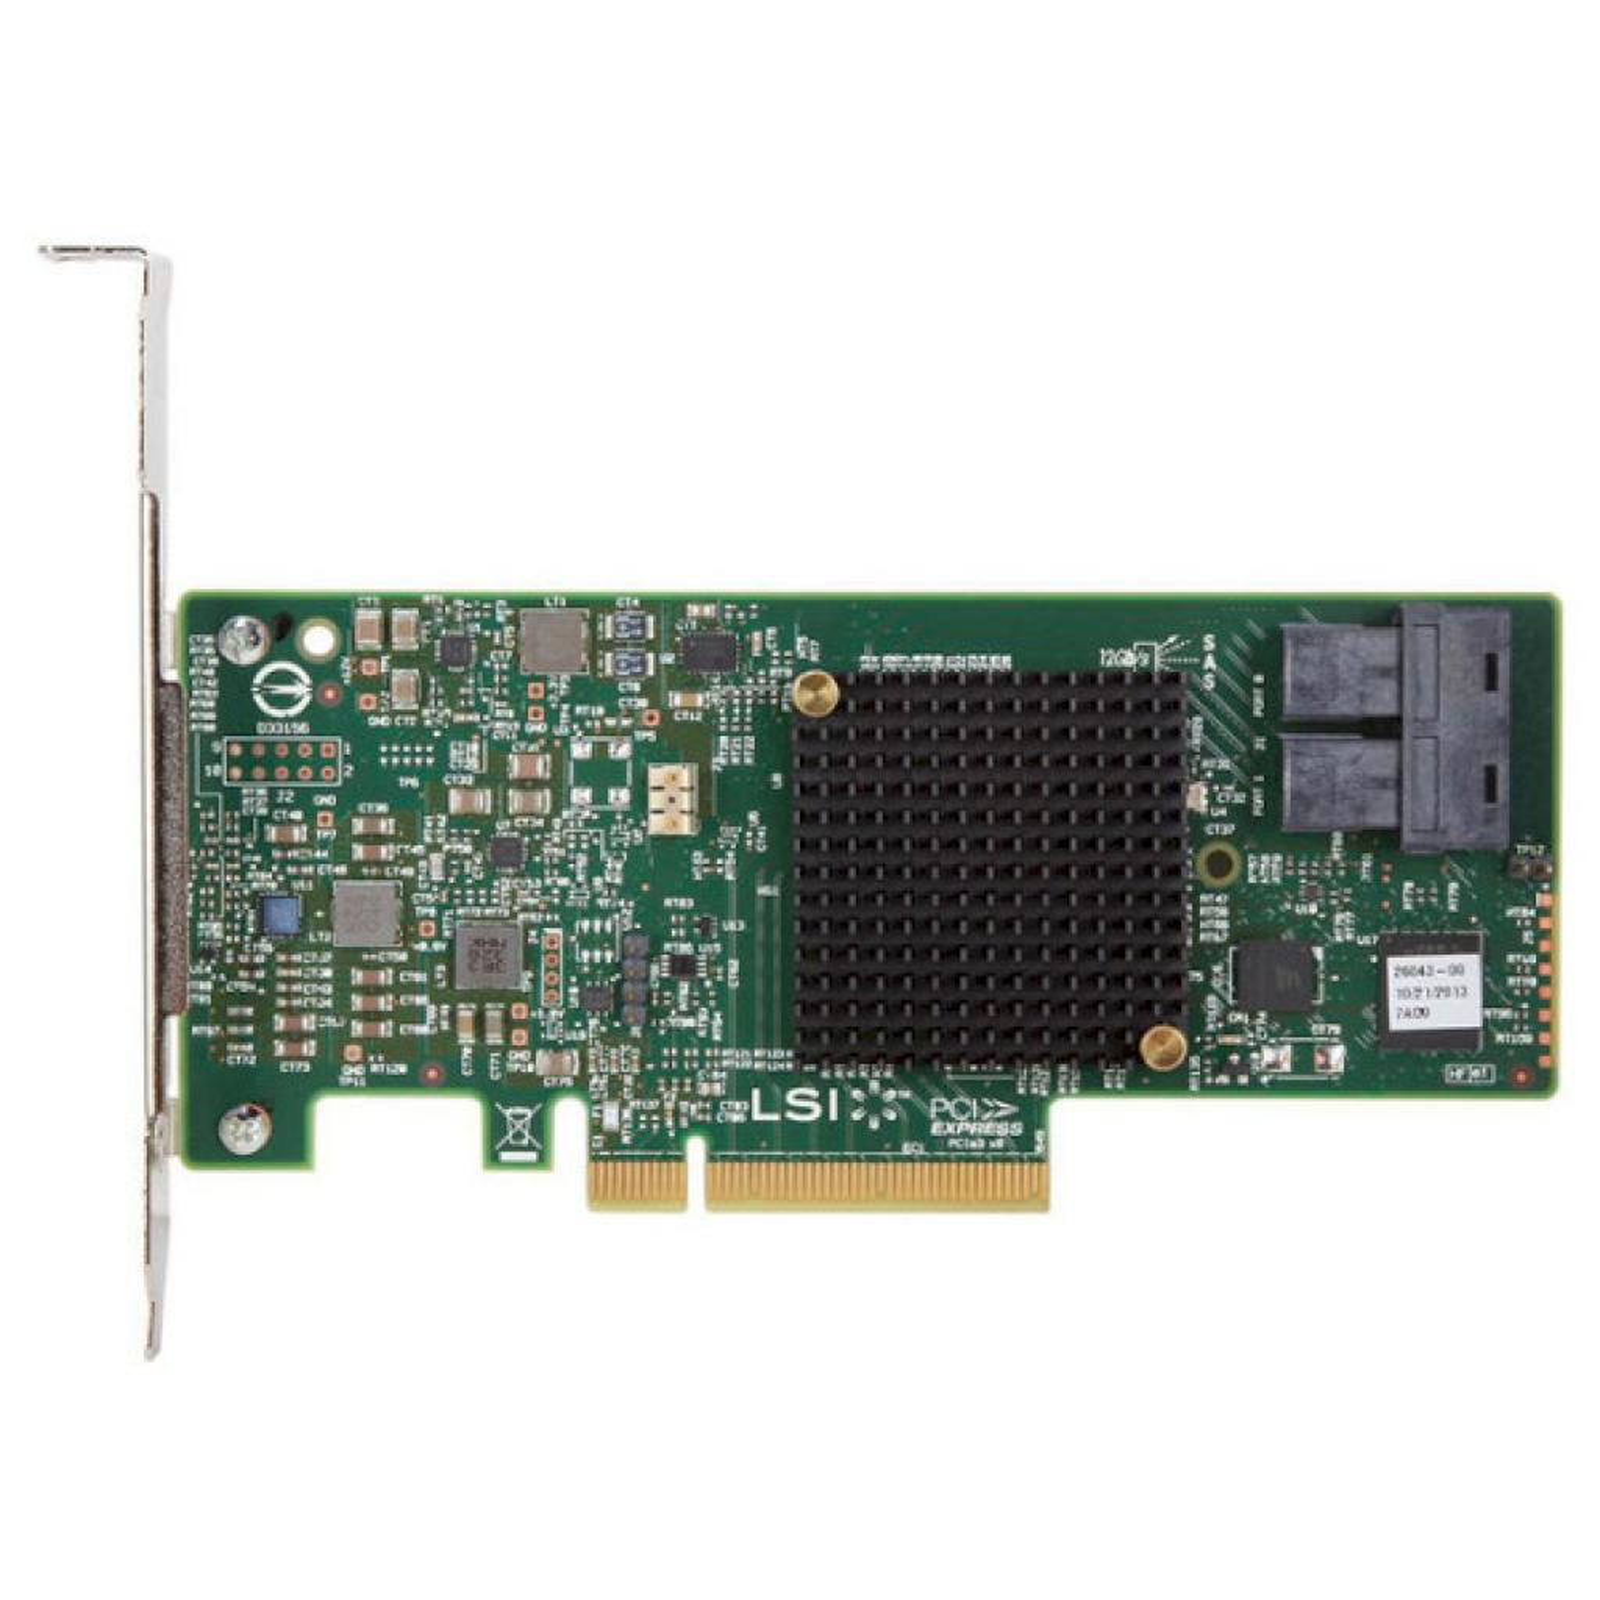 Контроллер RAID LSI MegaRAID SAS 9341-8i (05-26106-00)